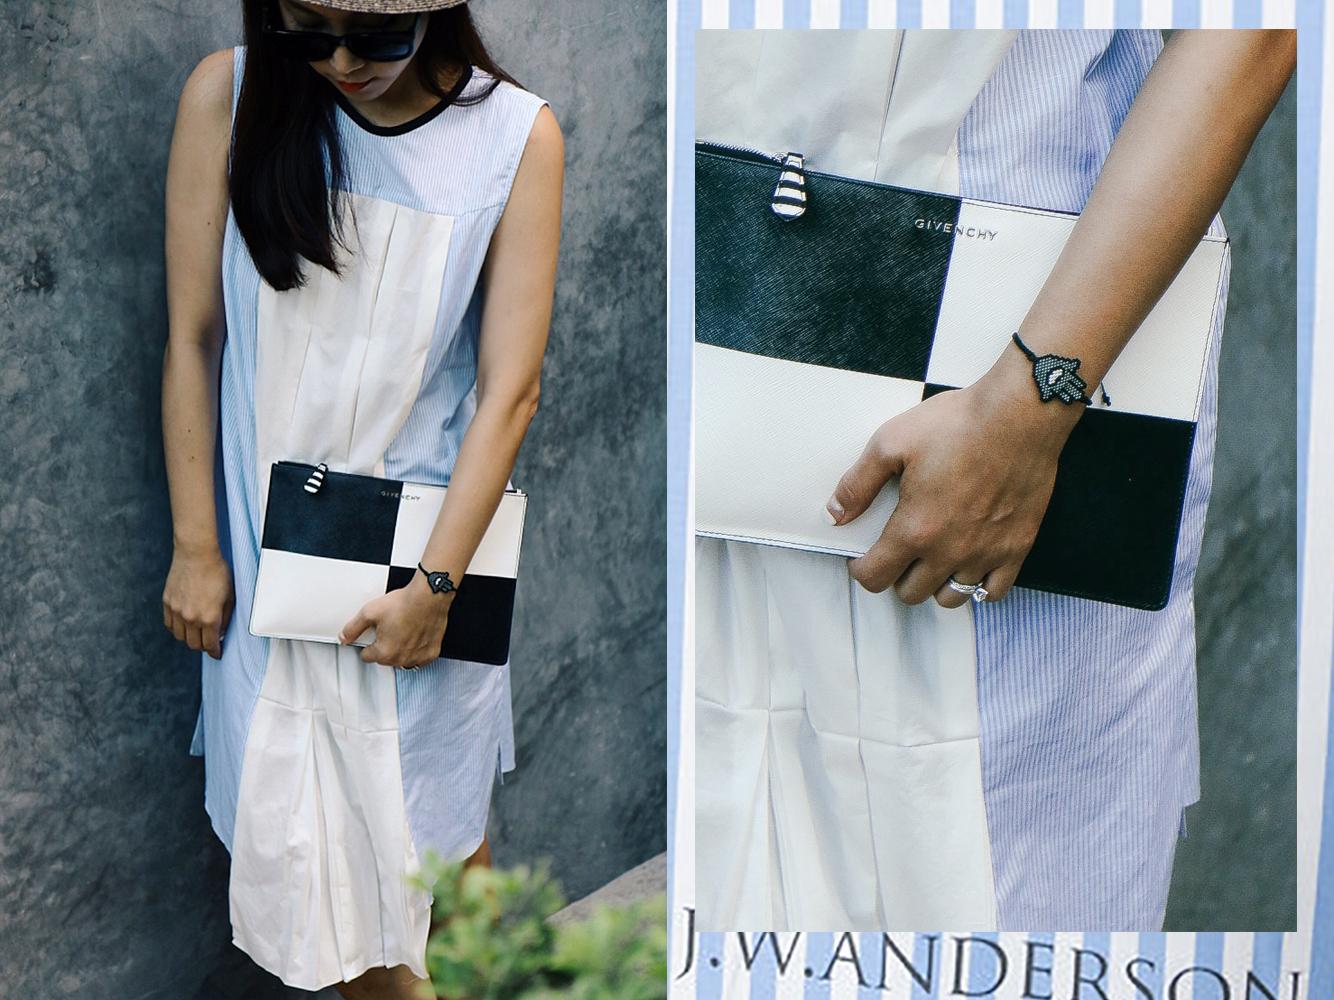 The Row Sunglasses, Givenchy Pouch, J.W. Anderson Dress,  Kaya Tulum Bracelet